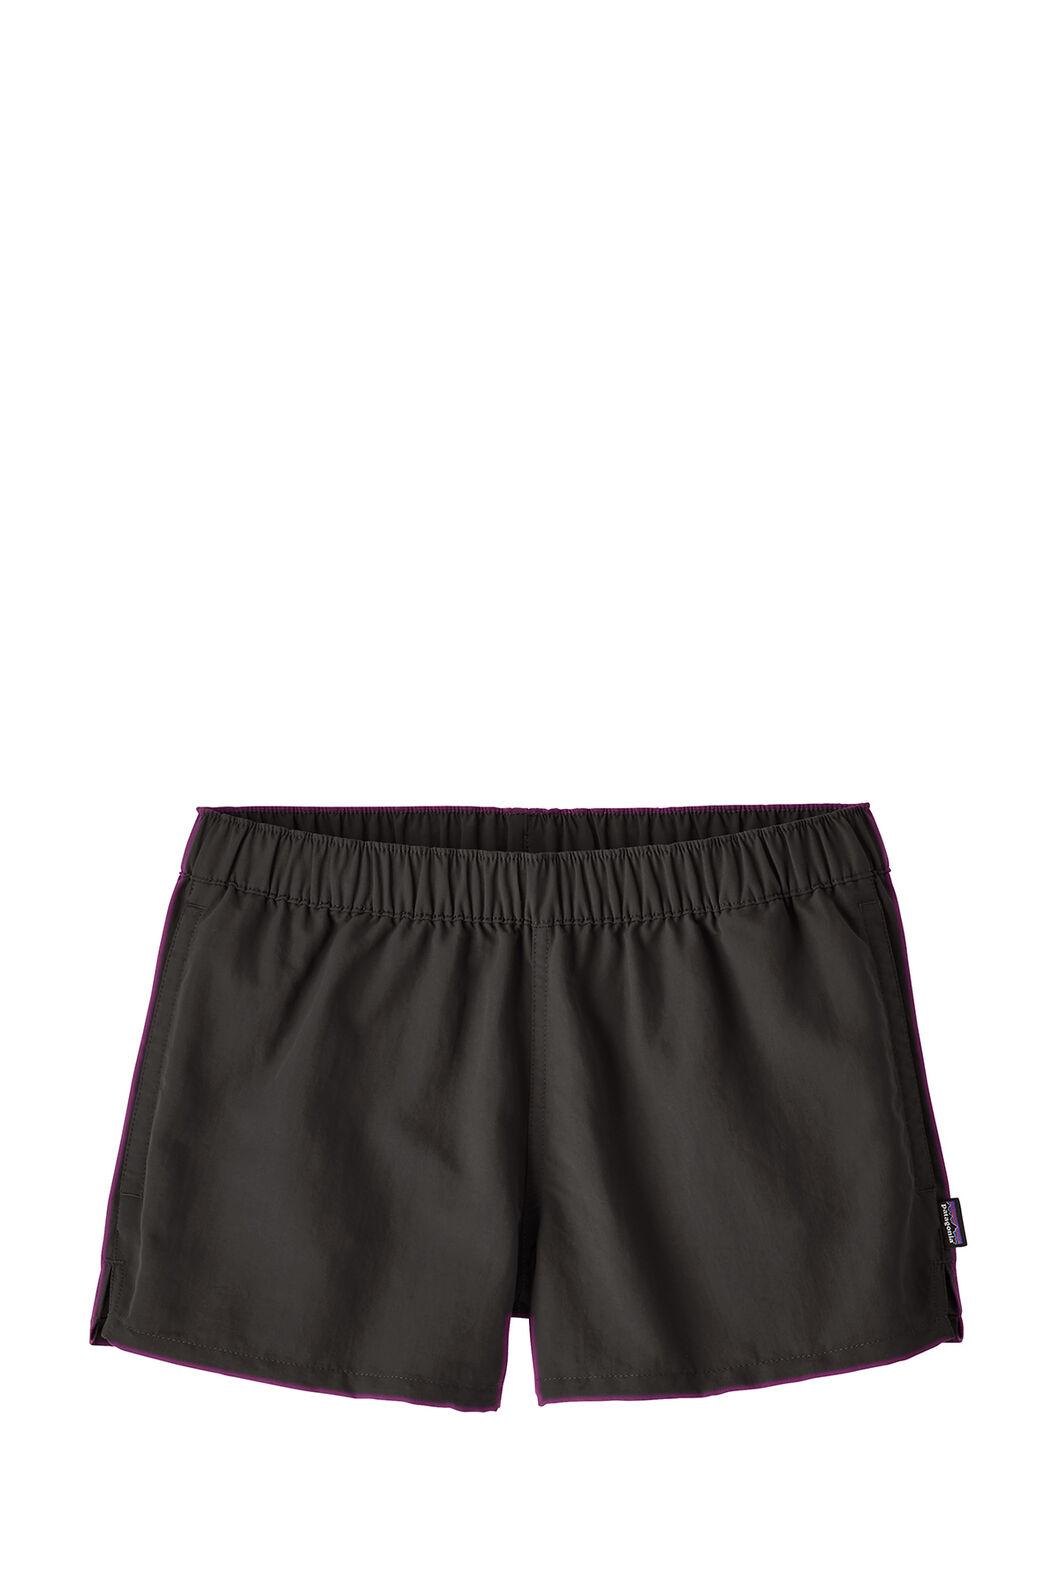 Patagonia Barely Baggies Shorts — Women's, Black, hi-res